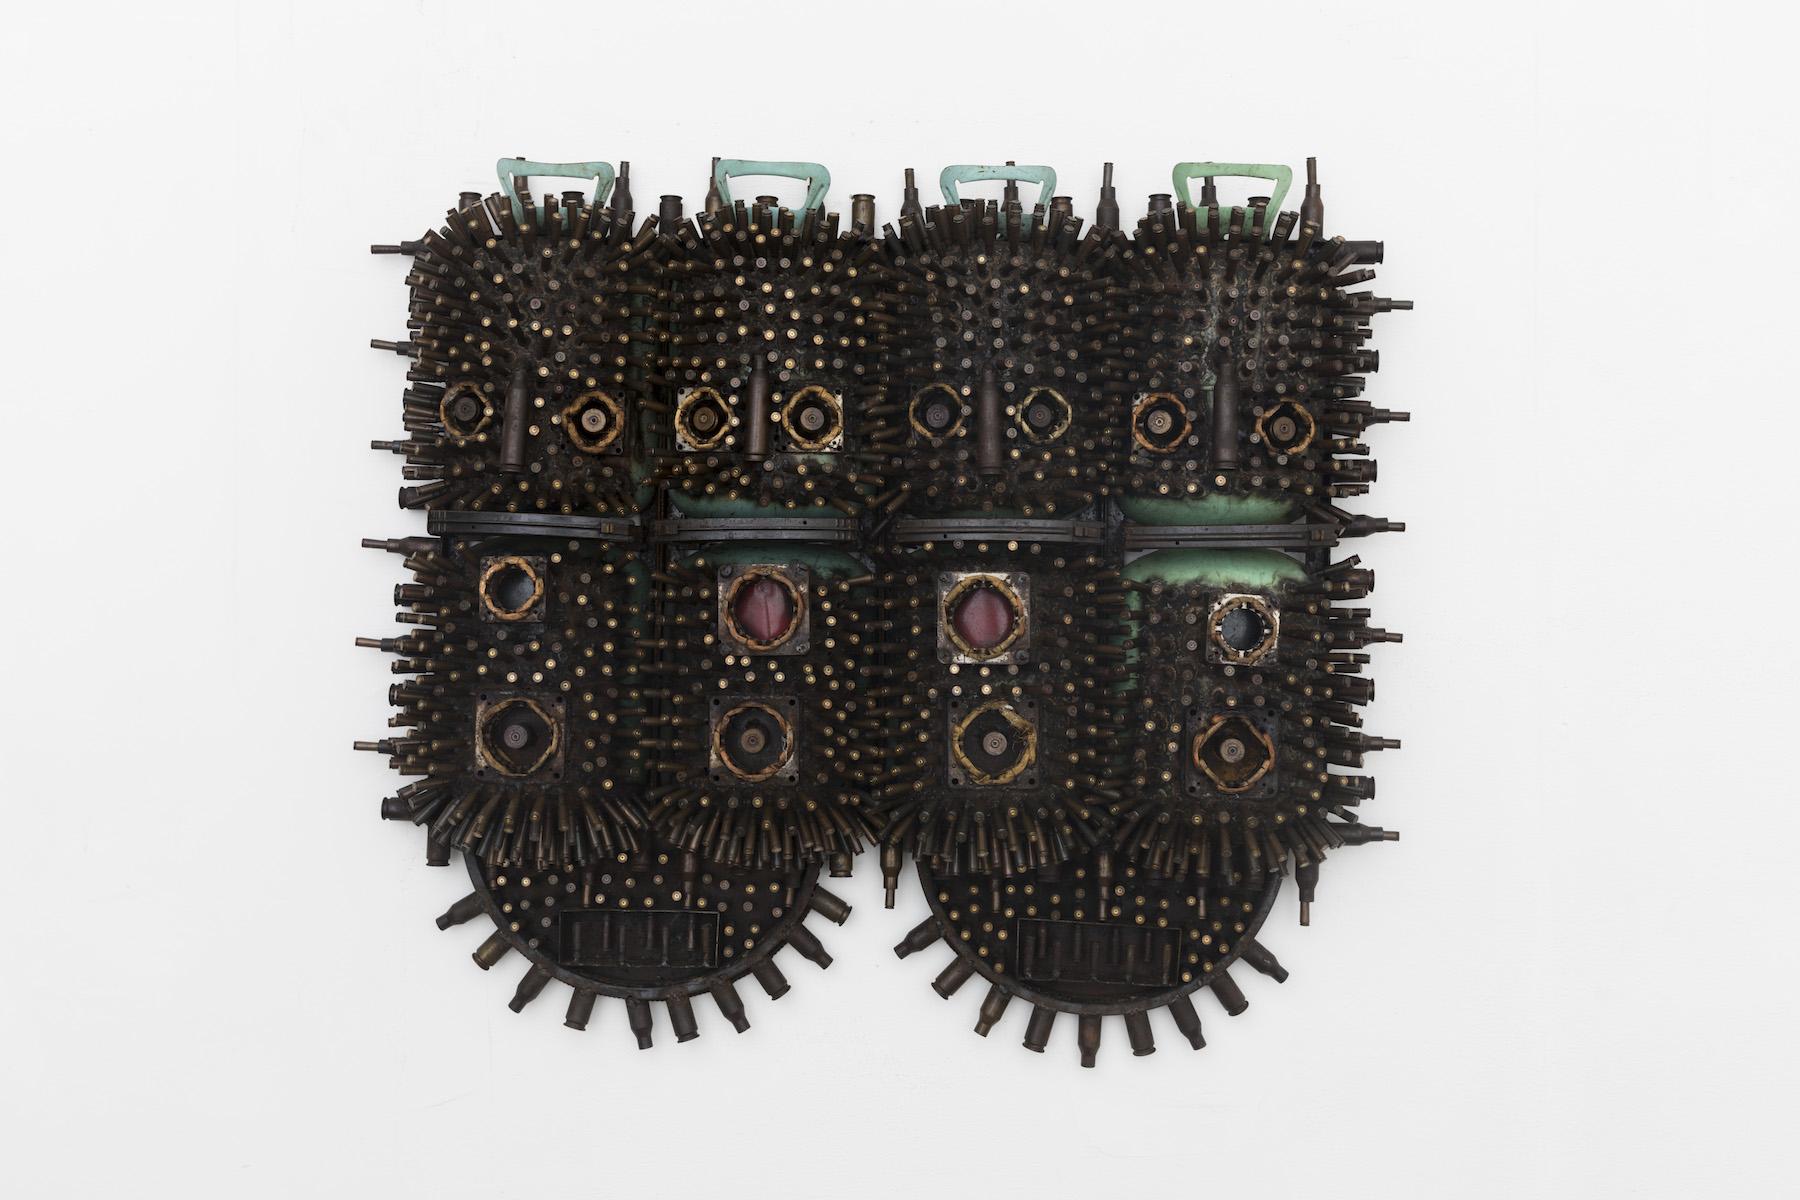 Gonçalo Mabunda, Untitled (Masks), 2018-2019, tecnica mista, cm 102x125